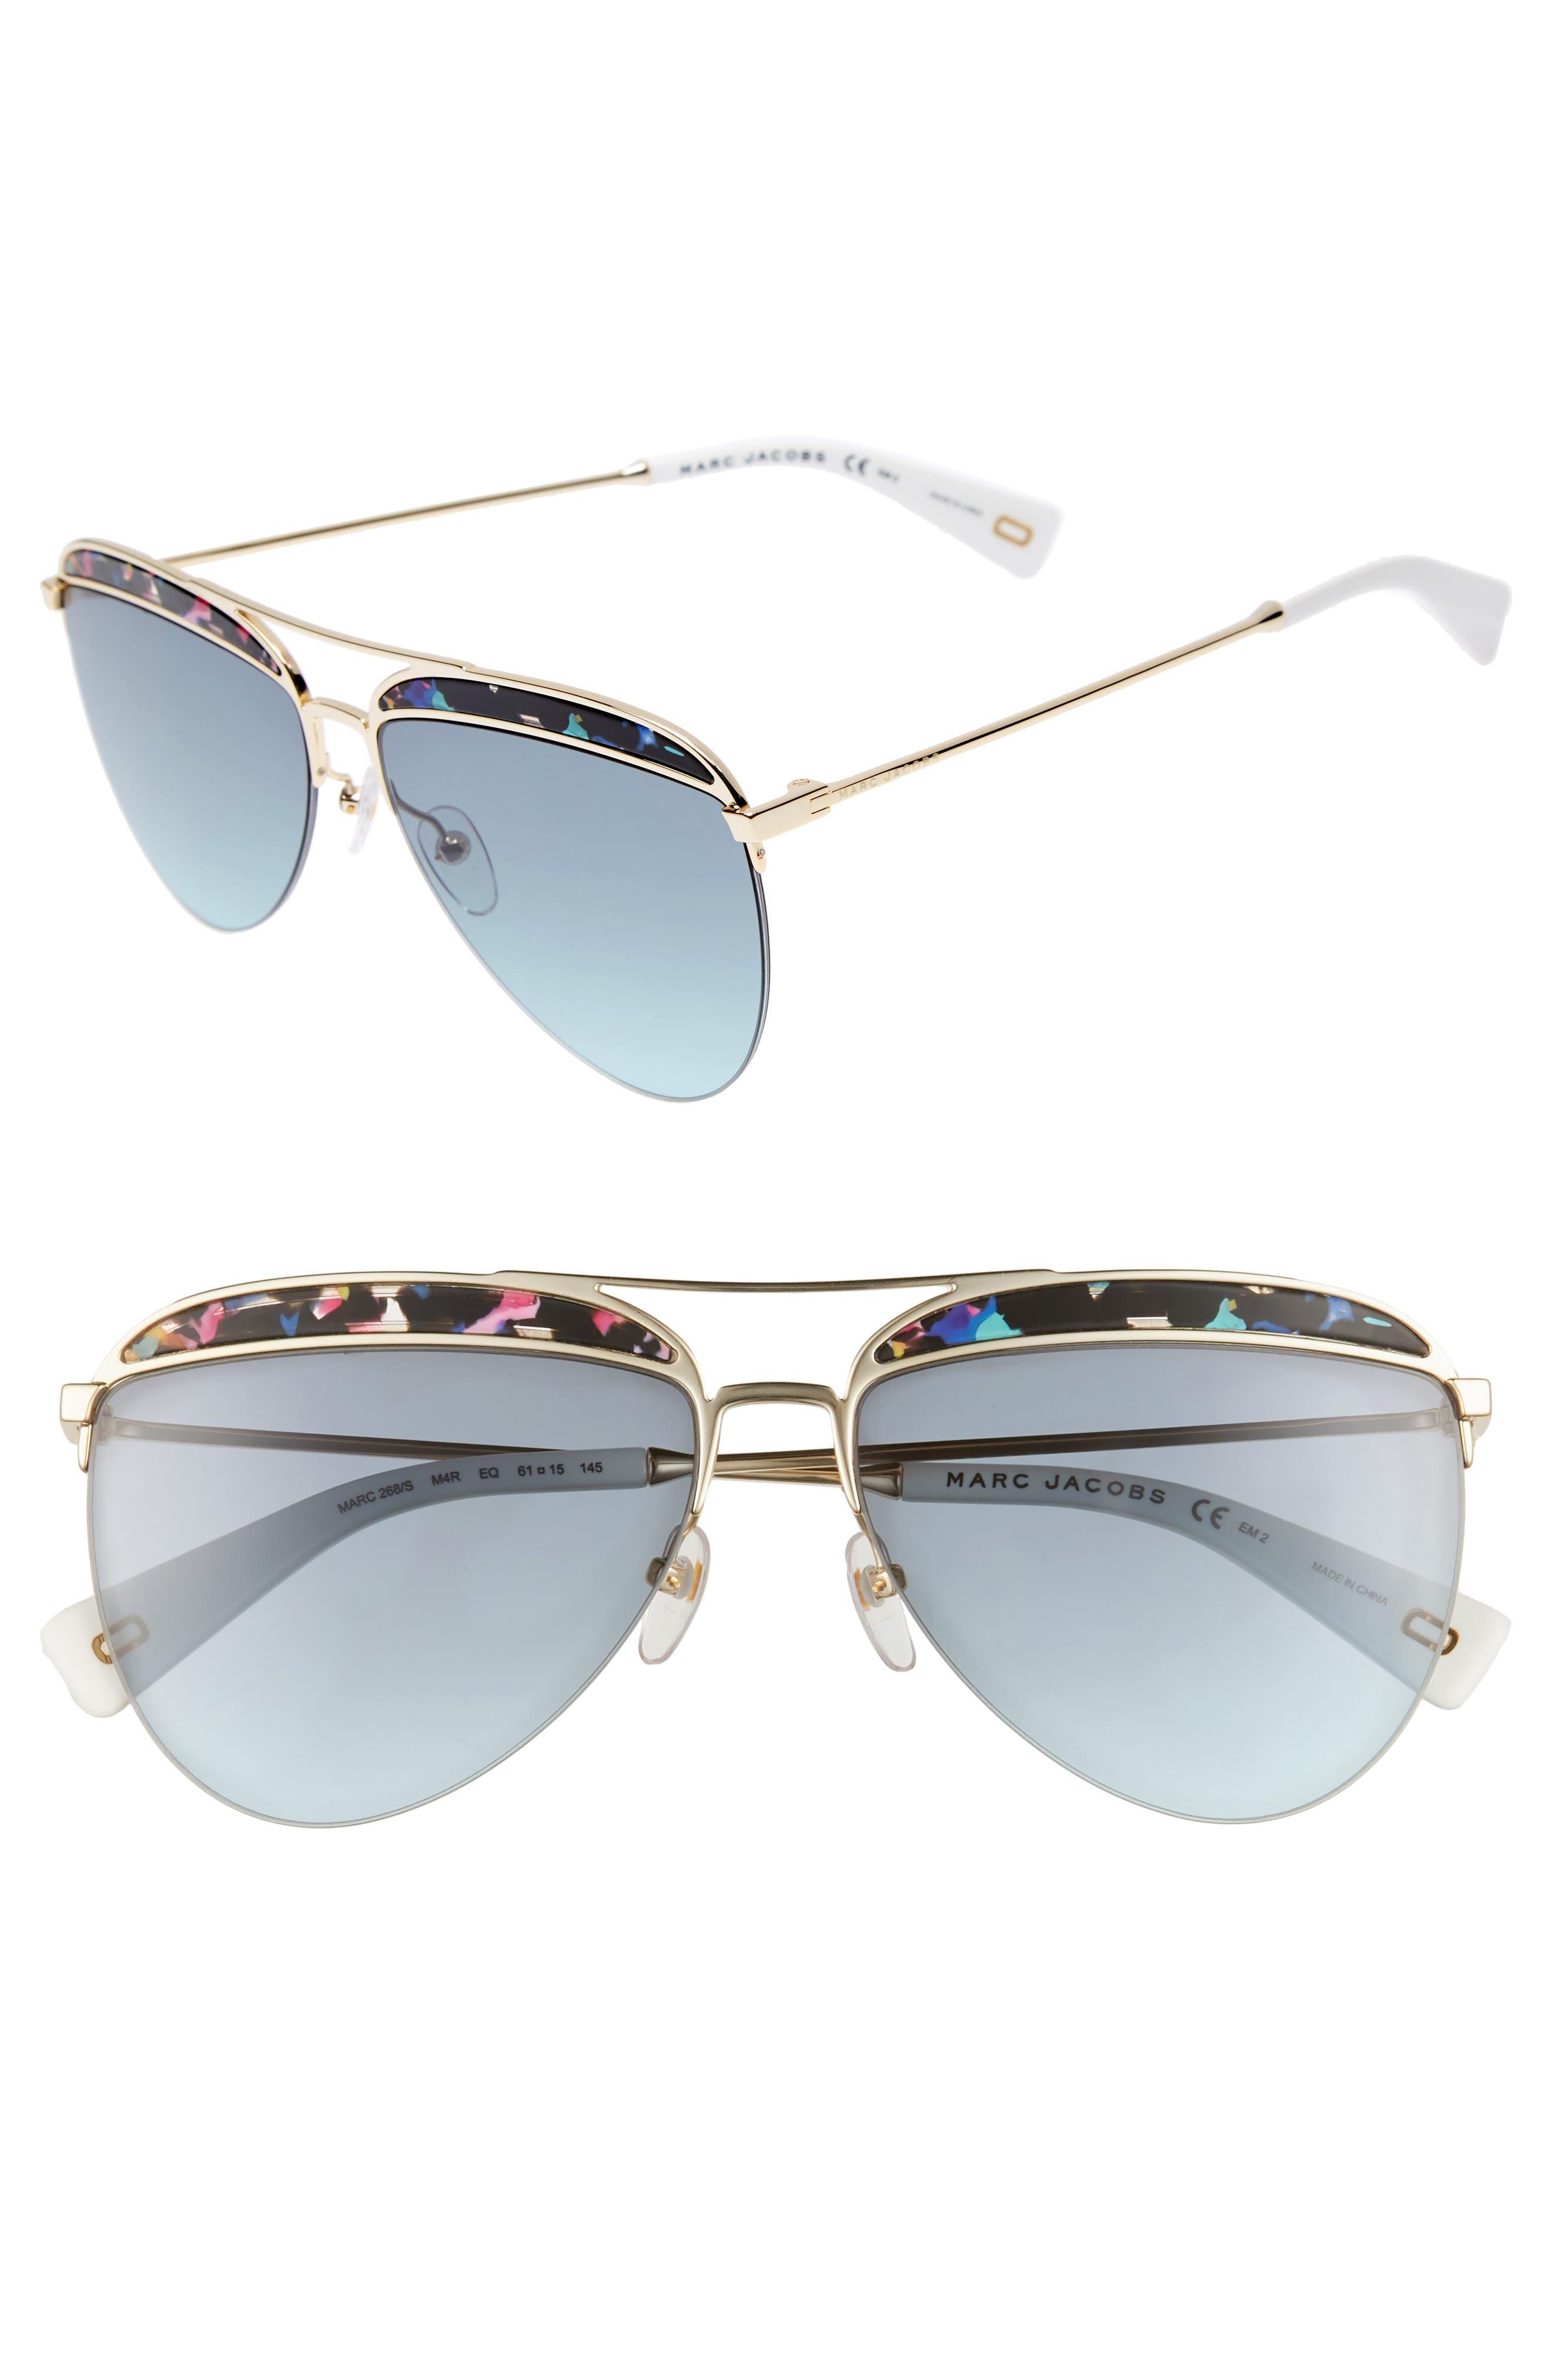 61Mm Aviator Sunglasses - Turquoise/ Havana/ Black